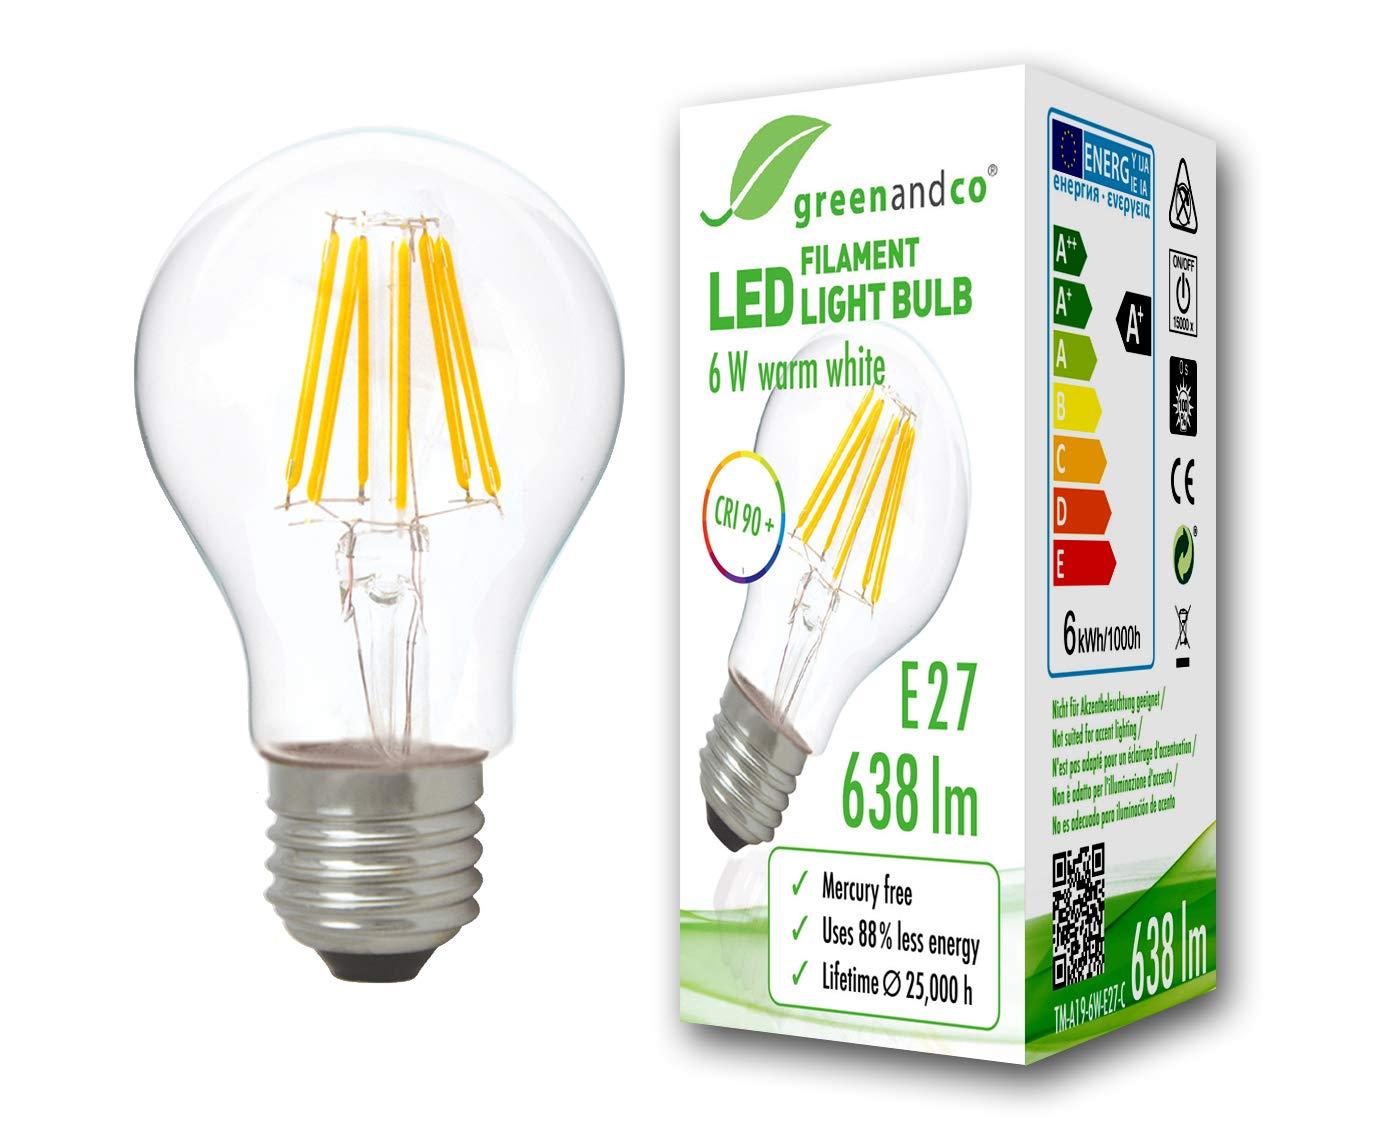 Bombilla de filamento LED greenandco® IRC 90+ E27 6W (corresponde a 50W) 638lm 2700K (blanco cálido) 360° 230V AC vidrio, sin parpadeo, no regulable: ...